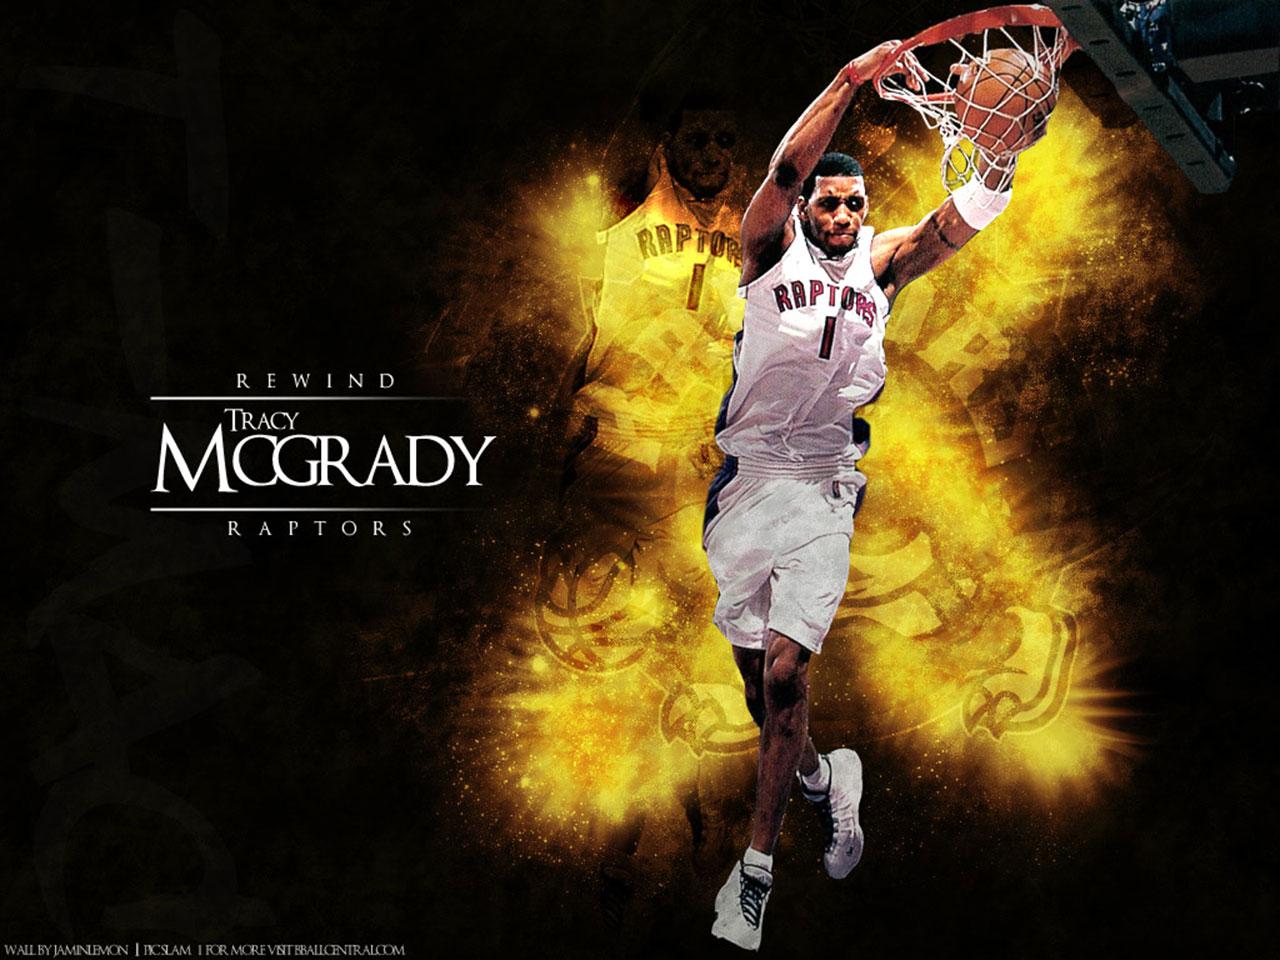 Mac Raptors Dunk Wallpaper Basketball Wallpapers at 1280x960